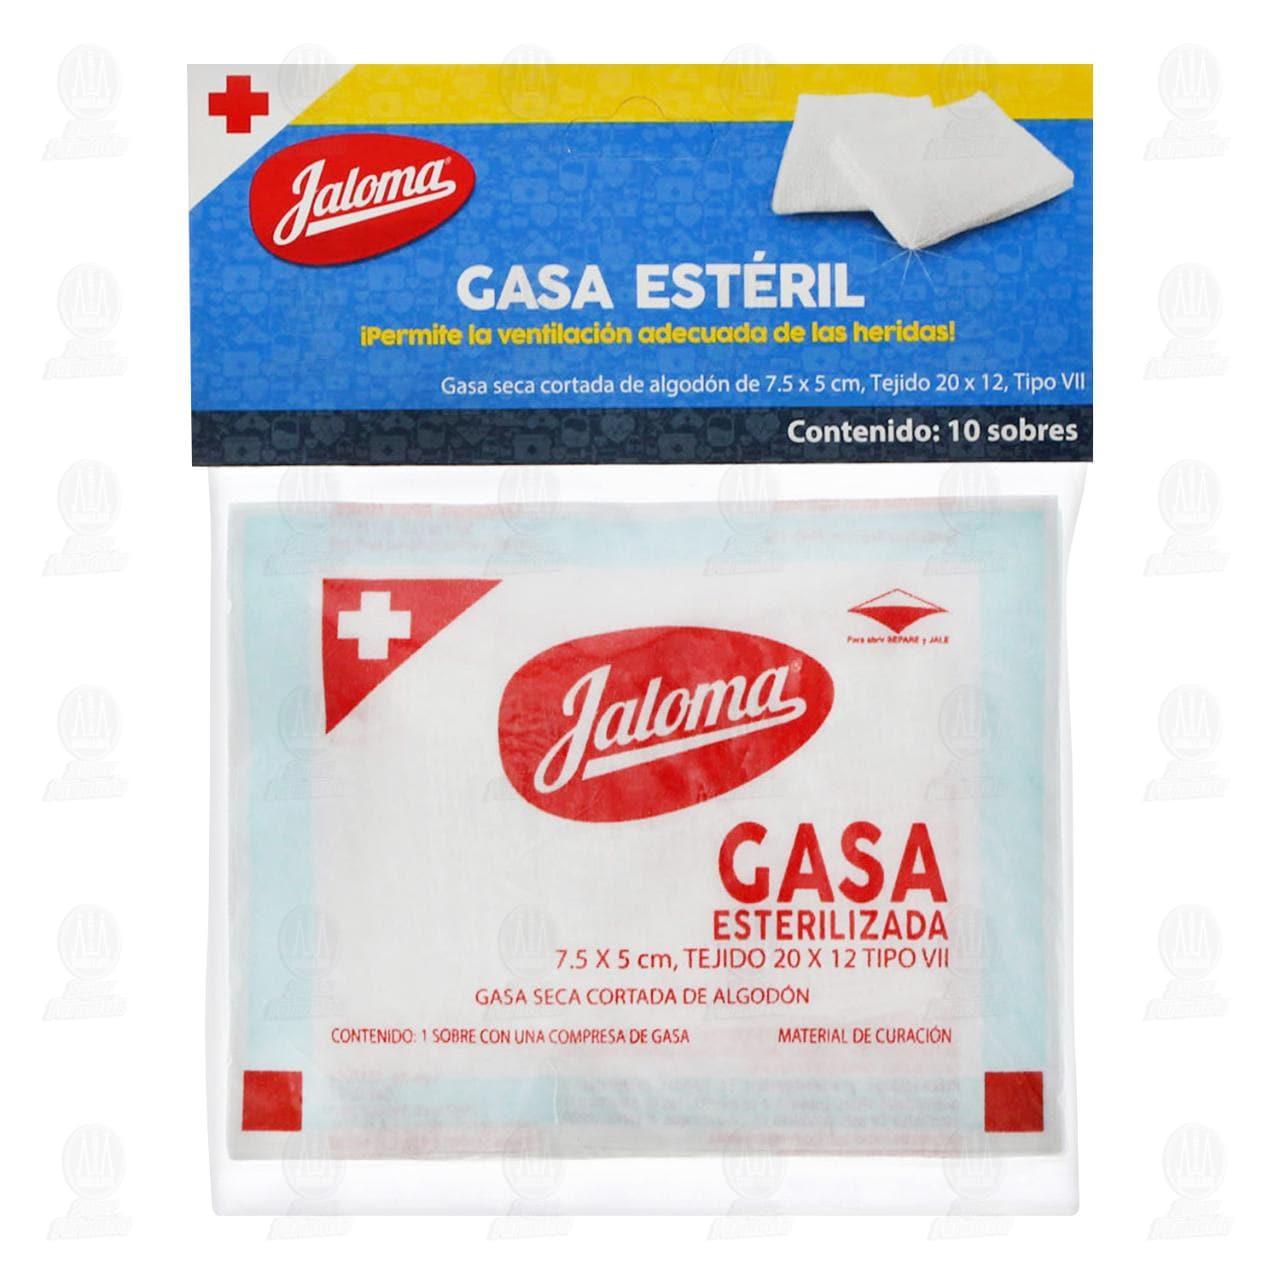 Gasa Jaloma 7.5 X 5 Cm 10 Sobres